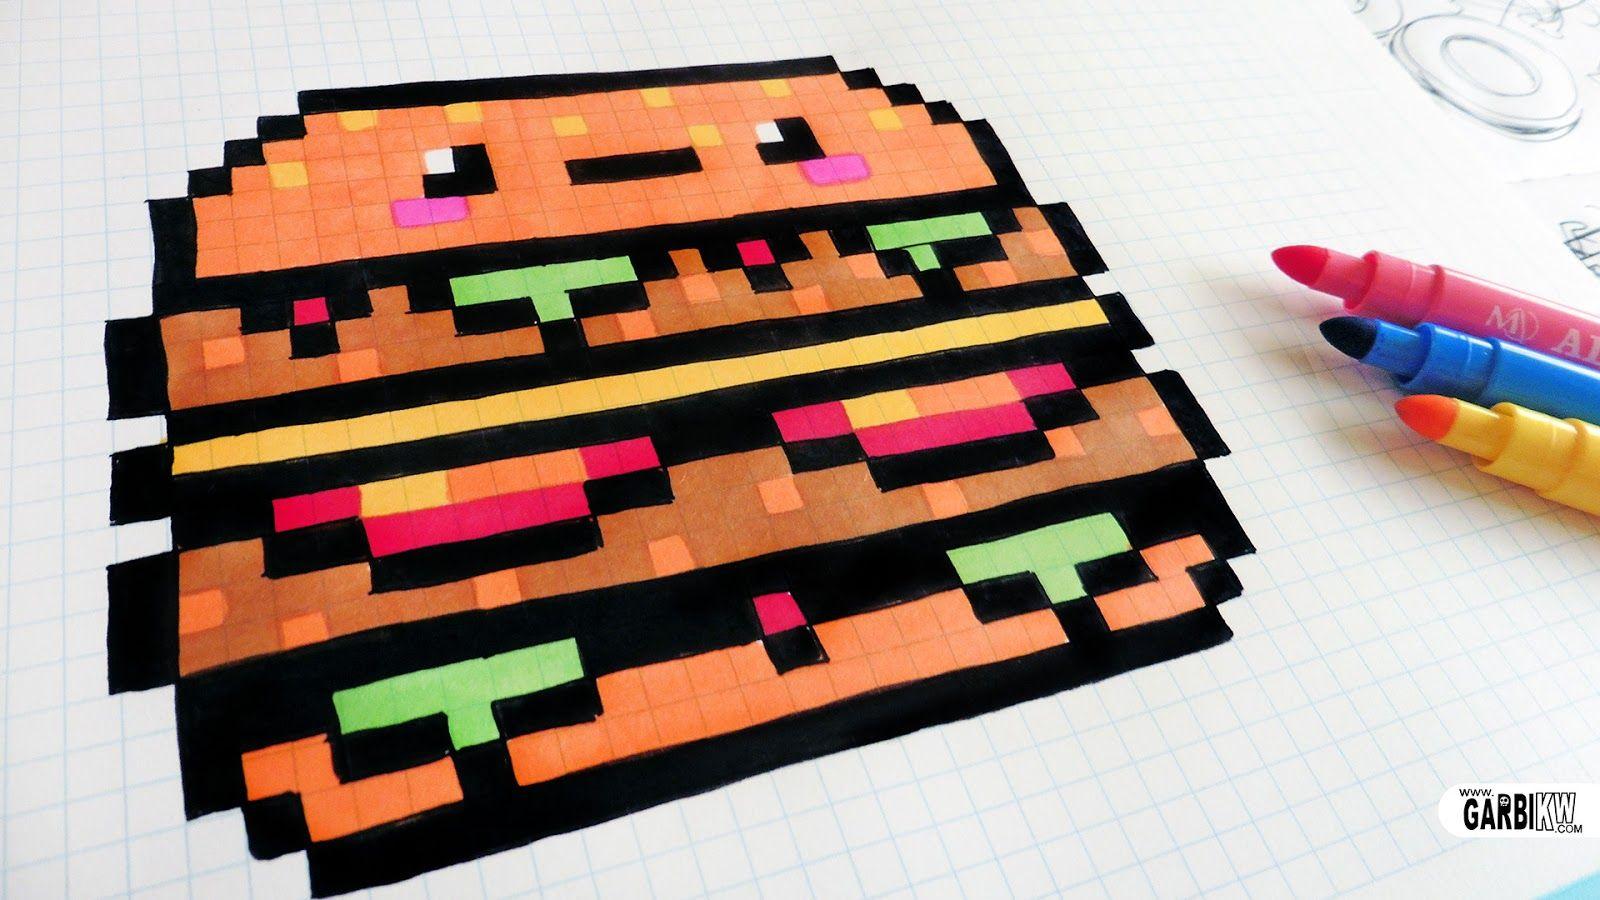 Resultado De Imagem Para Pixel Art Kawaii Oodles Of Doodles